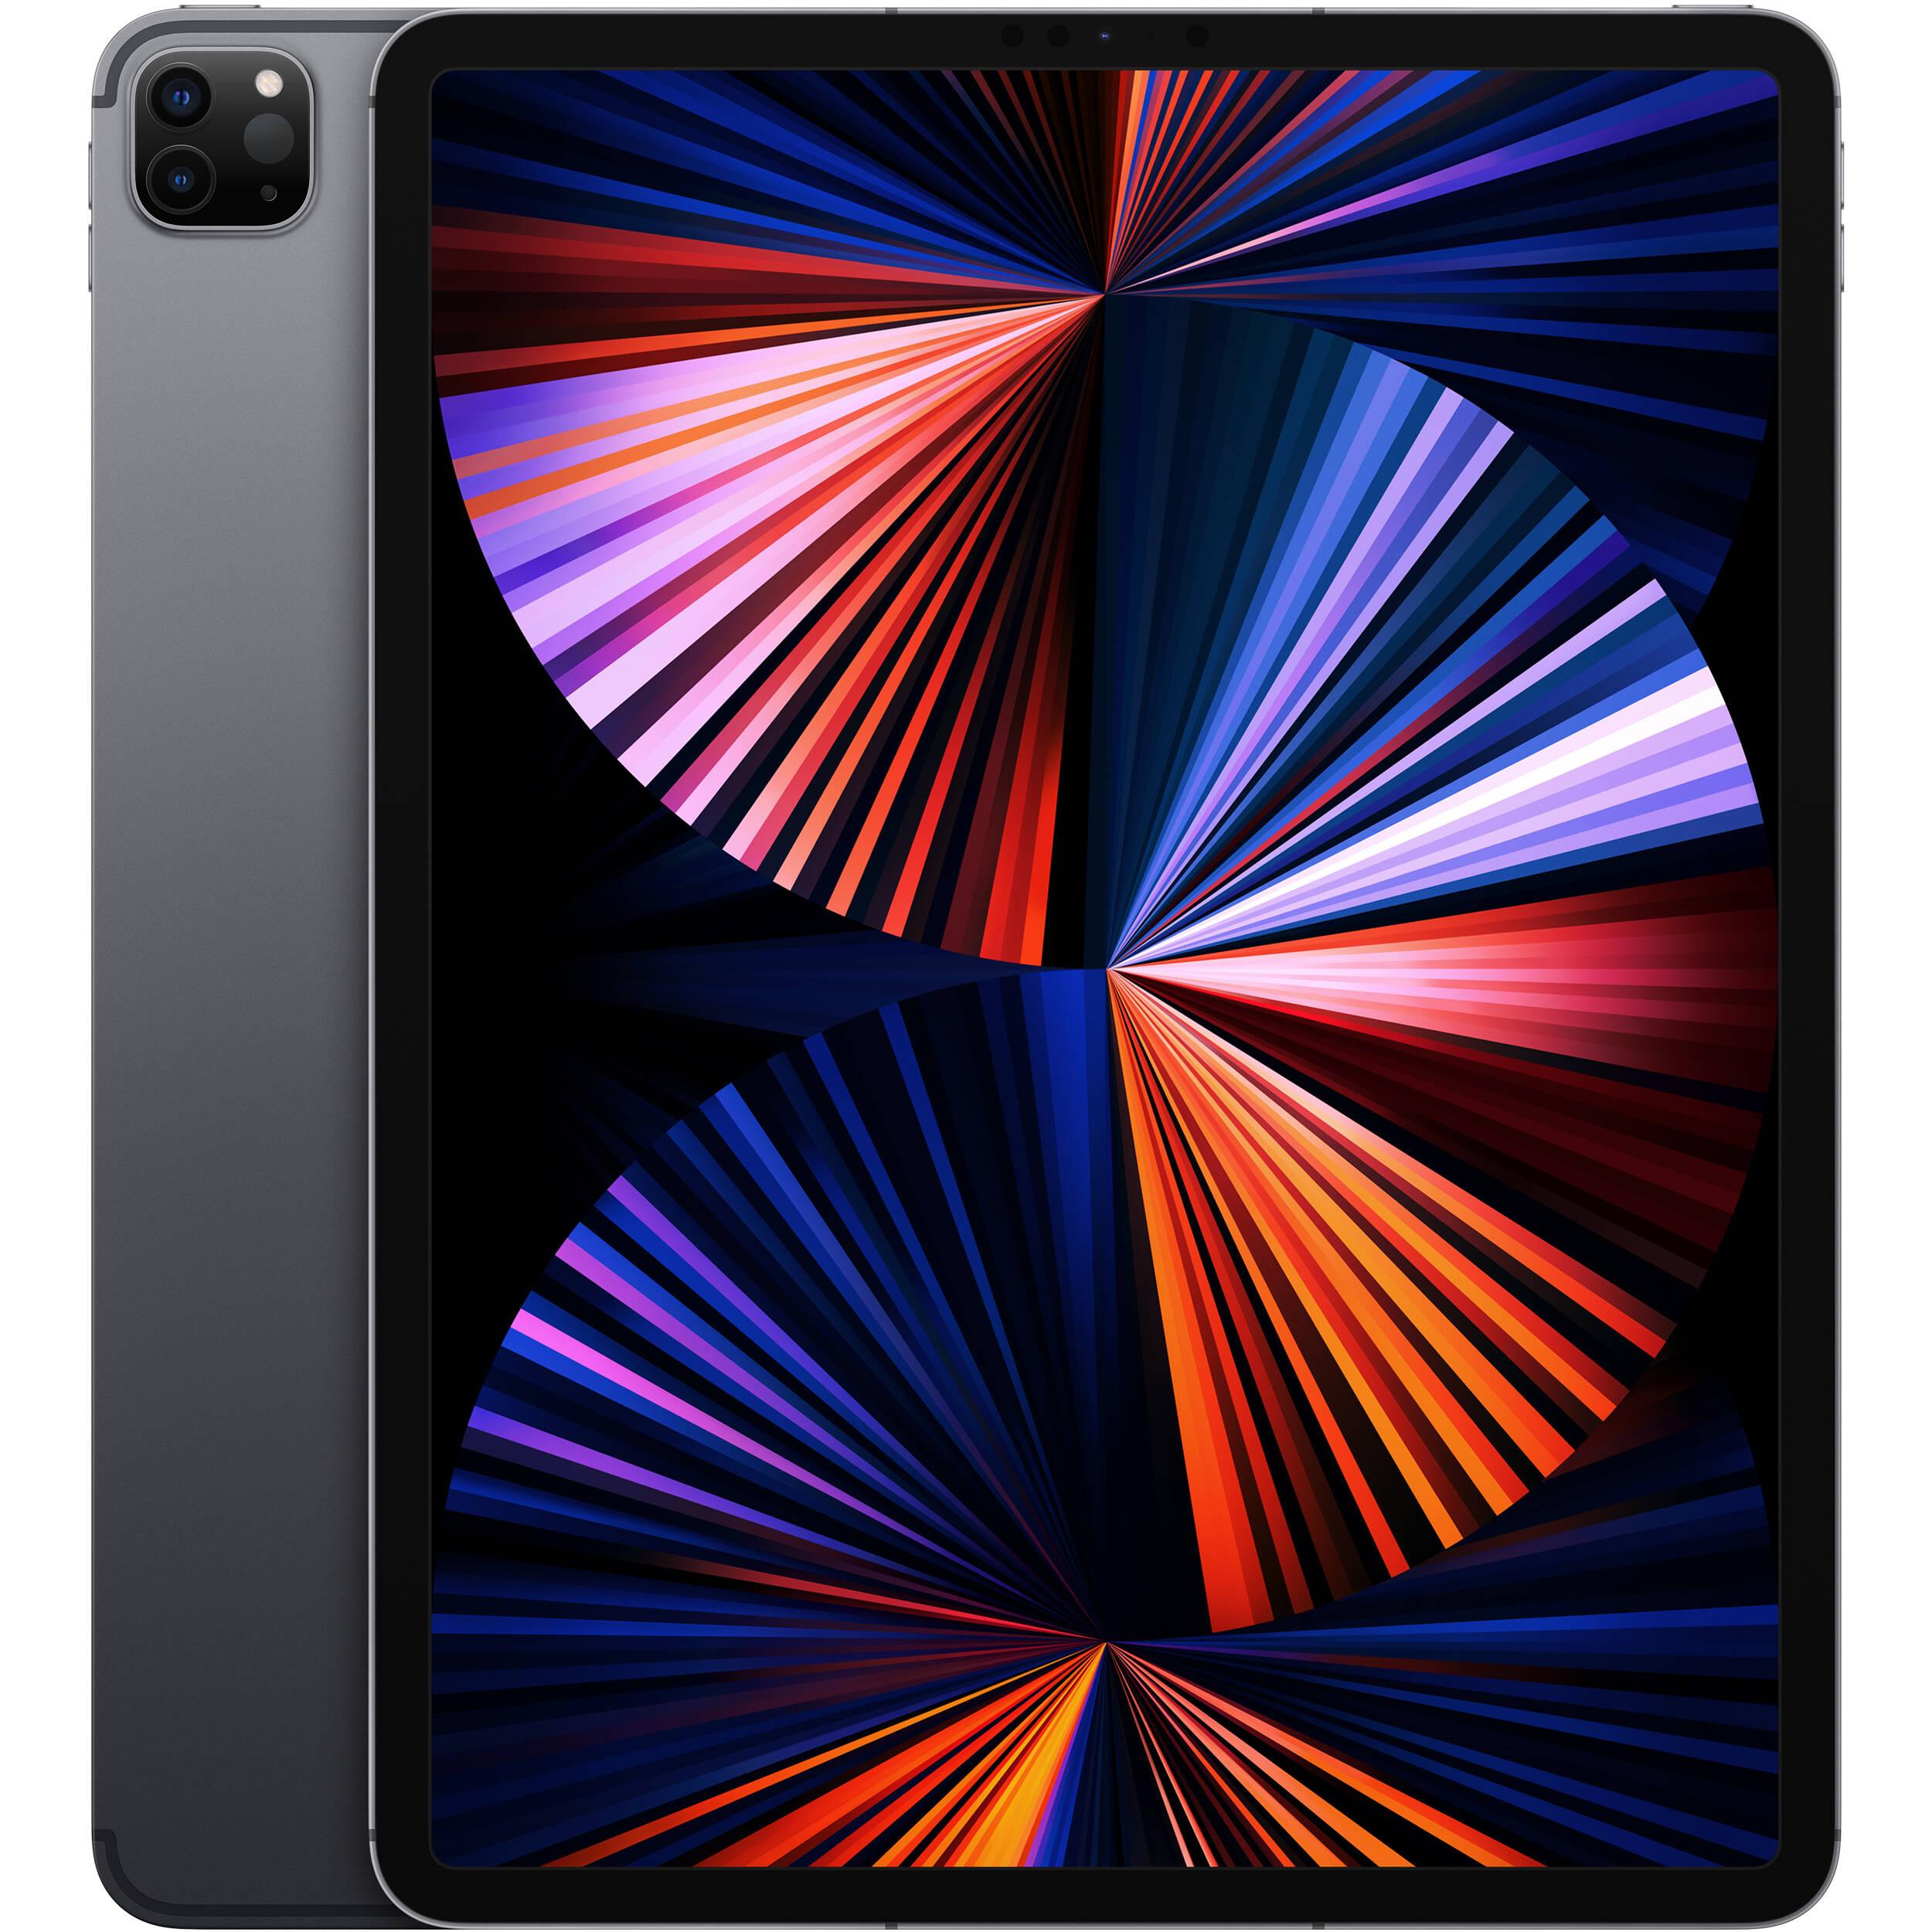 "Apple 12.9"" iPad Pro M1 Chip MHP43LL/A B&H Photo Video"